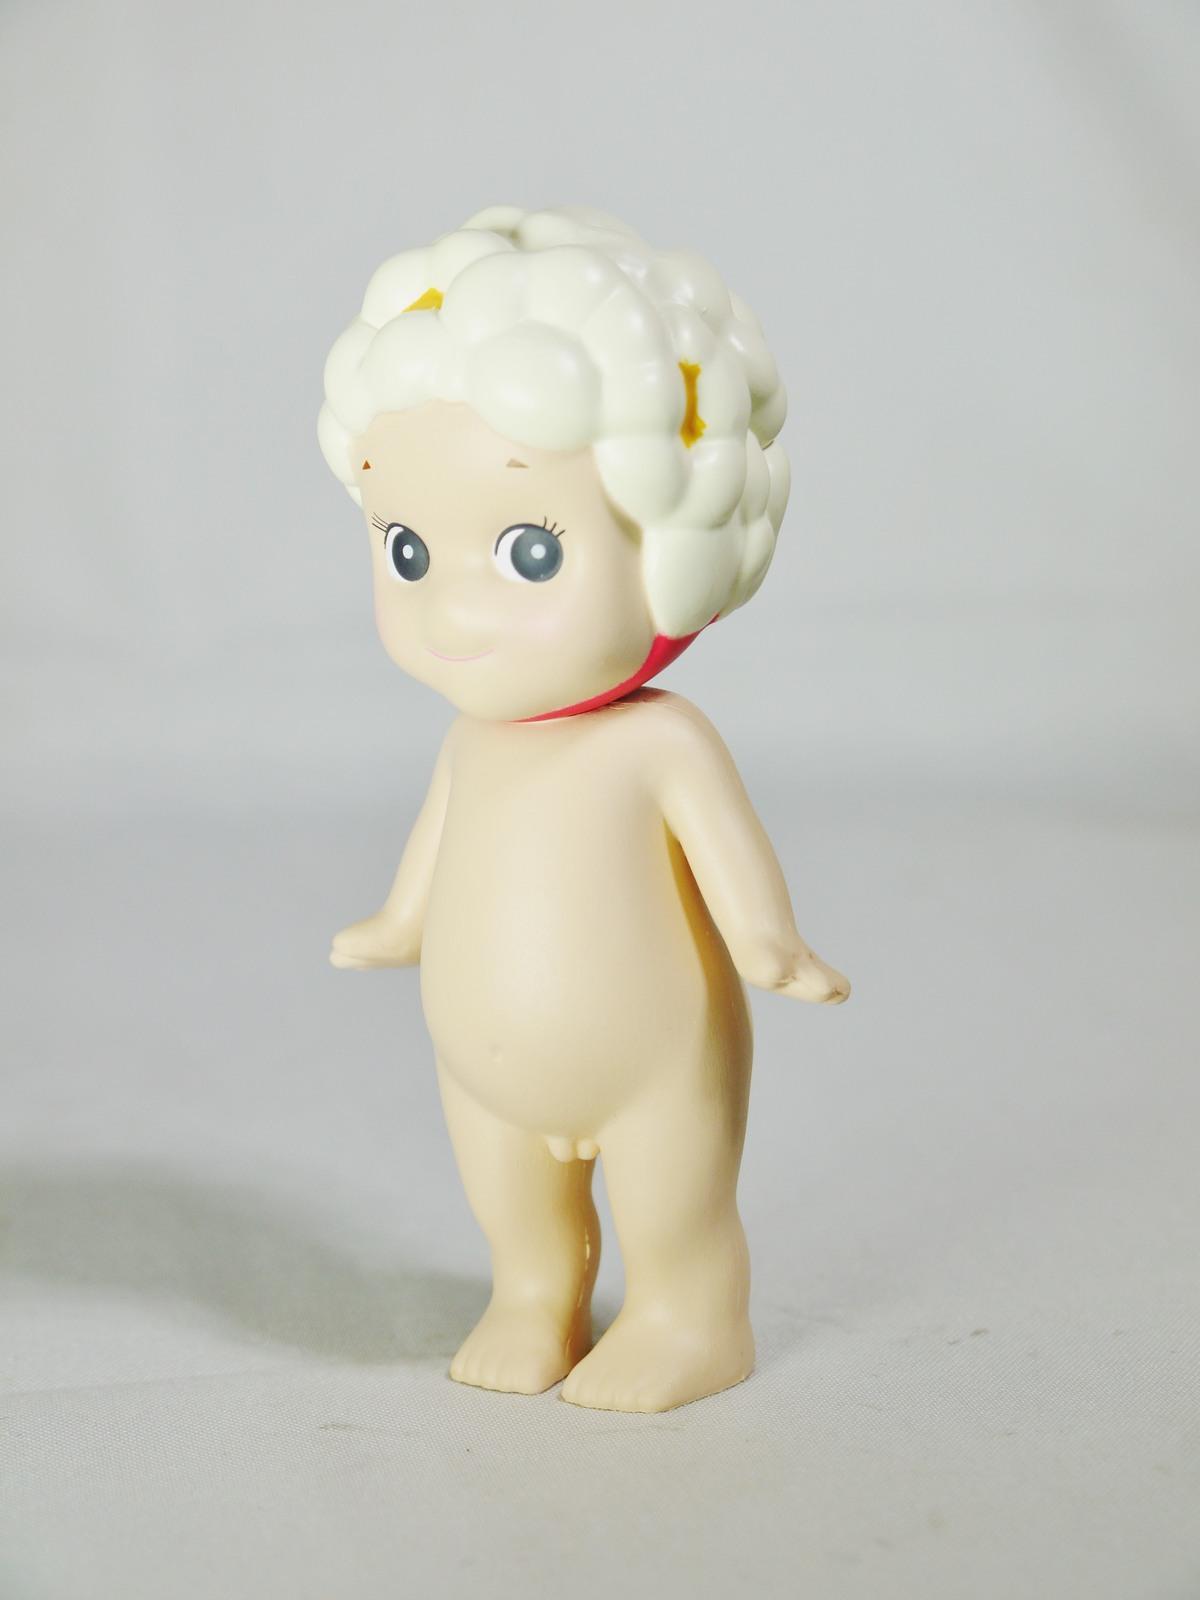 DREAMS Minifigure Sonny Angel CANDY SERIES 2017 POPCORN Figure